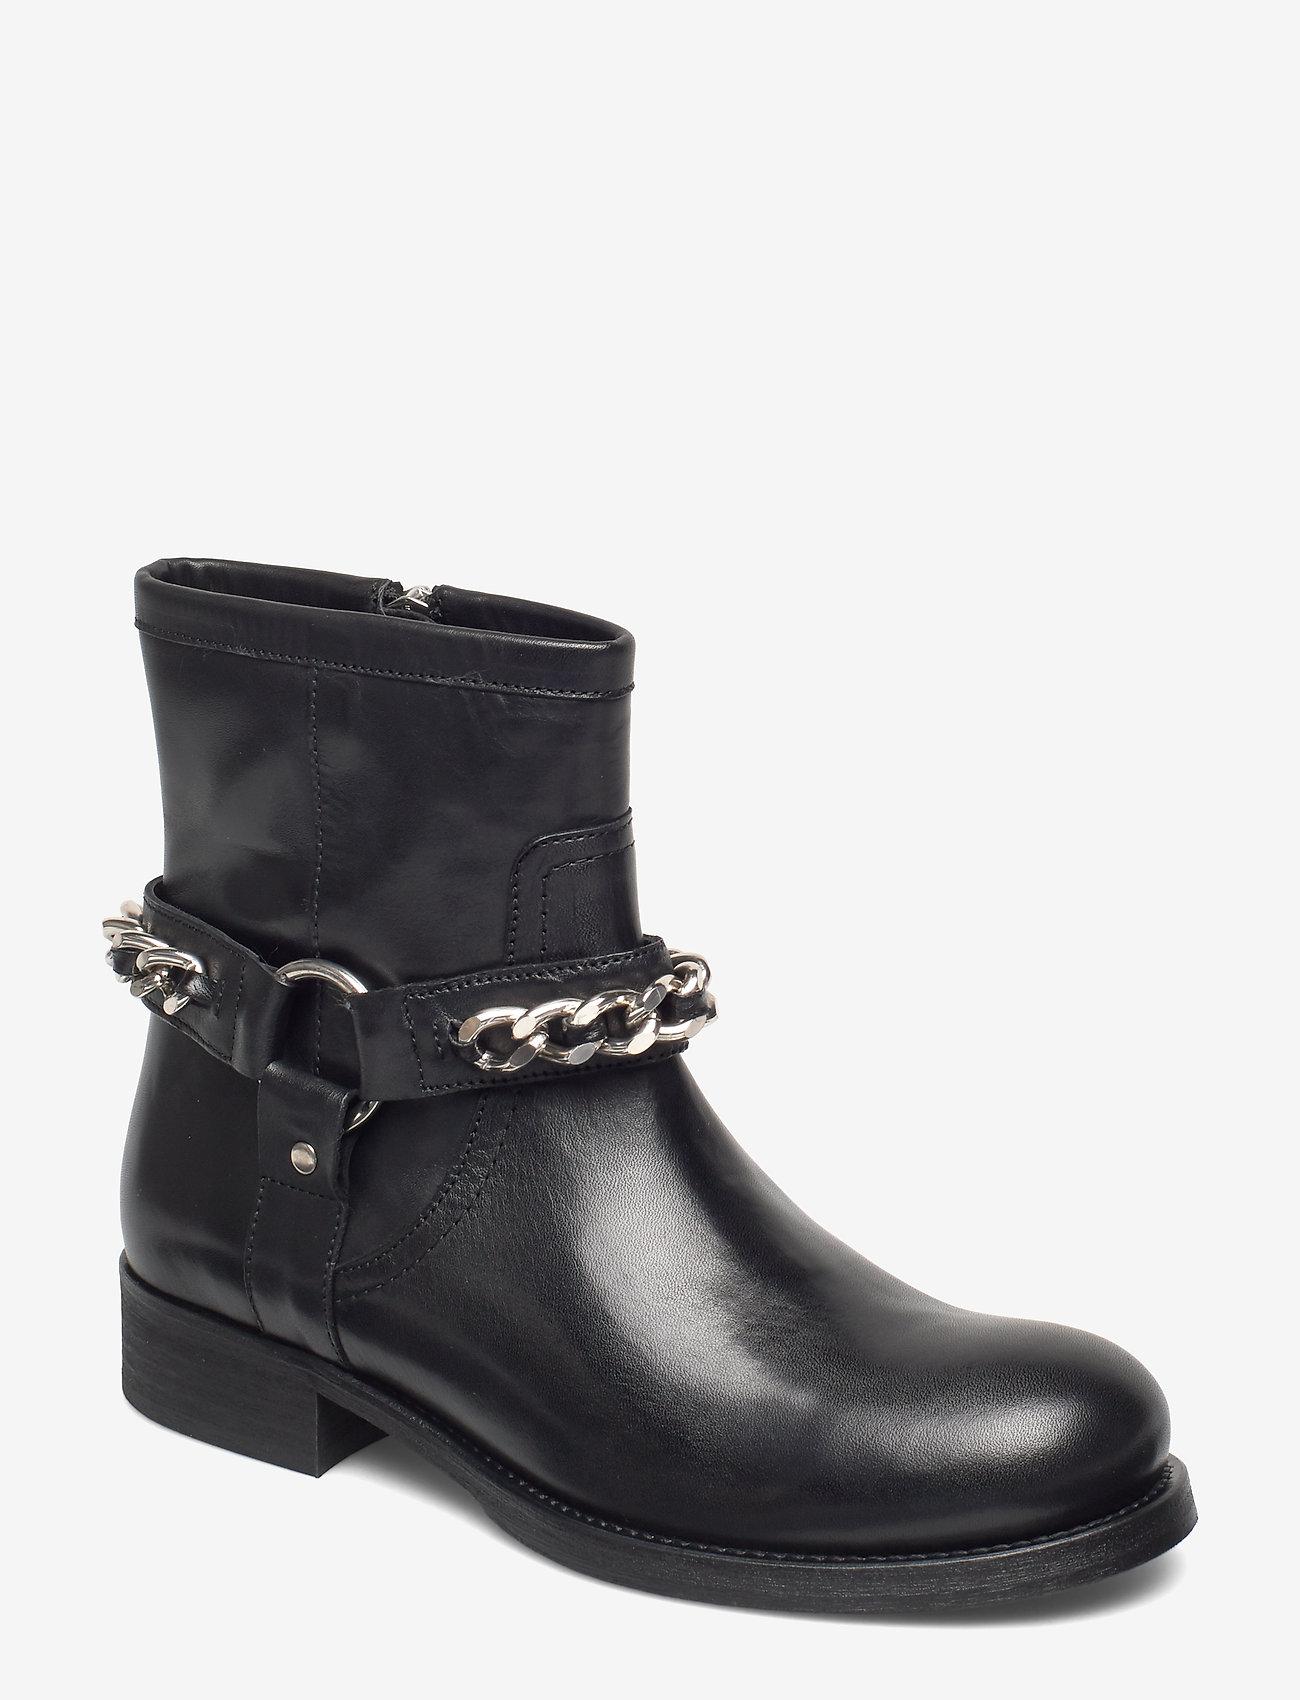 Billi Bi - Boots 3570 - flate ankelstøvletter - black calf/silver 803 - 0